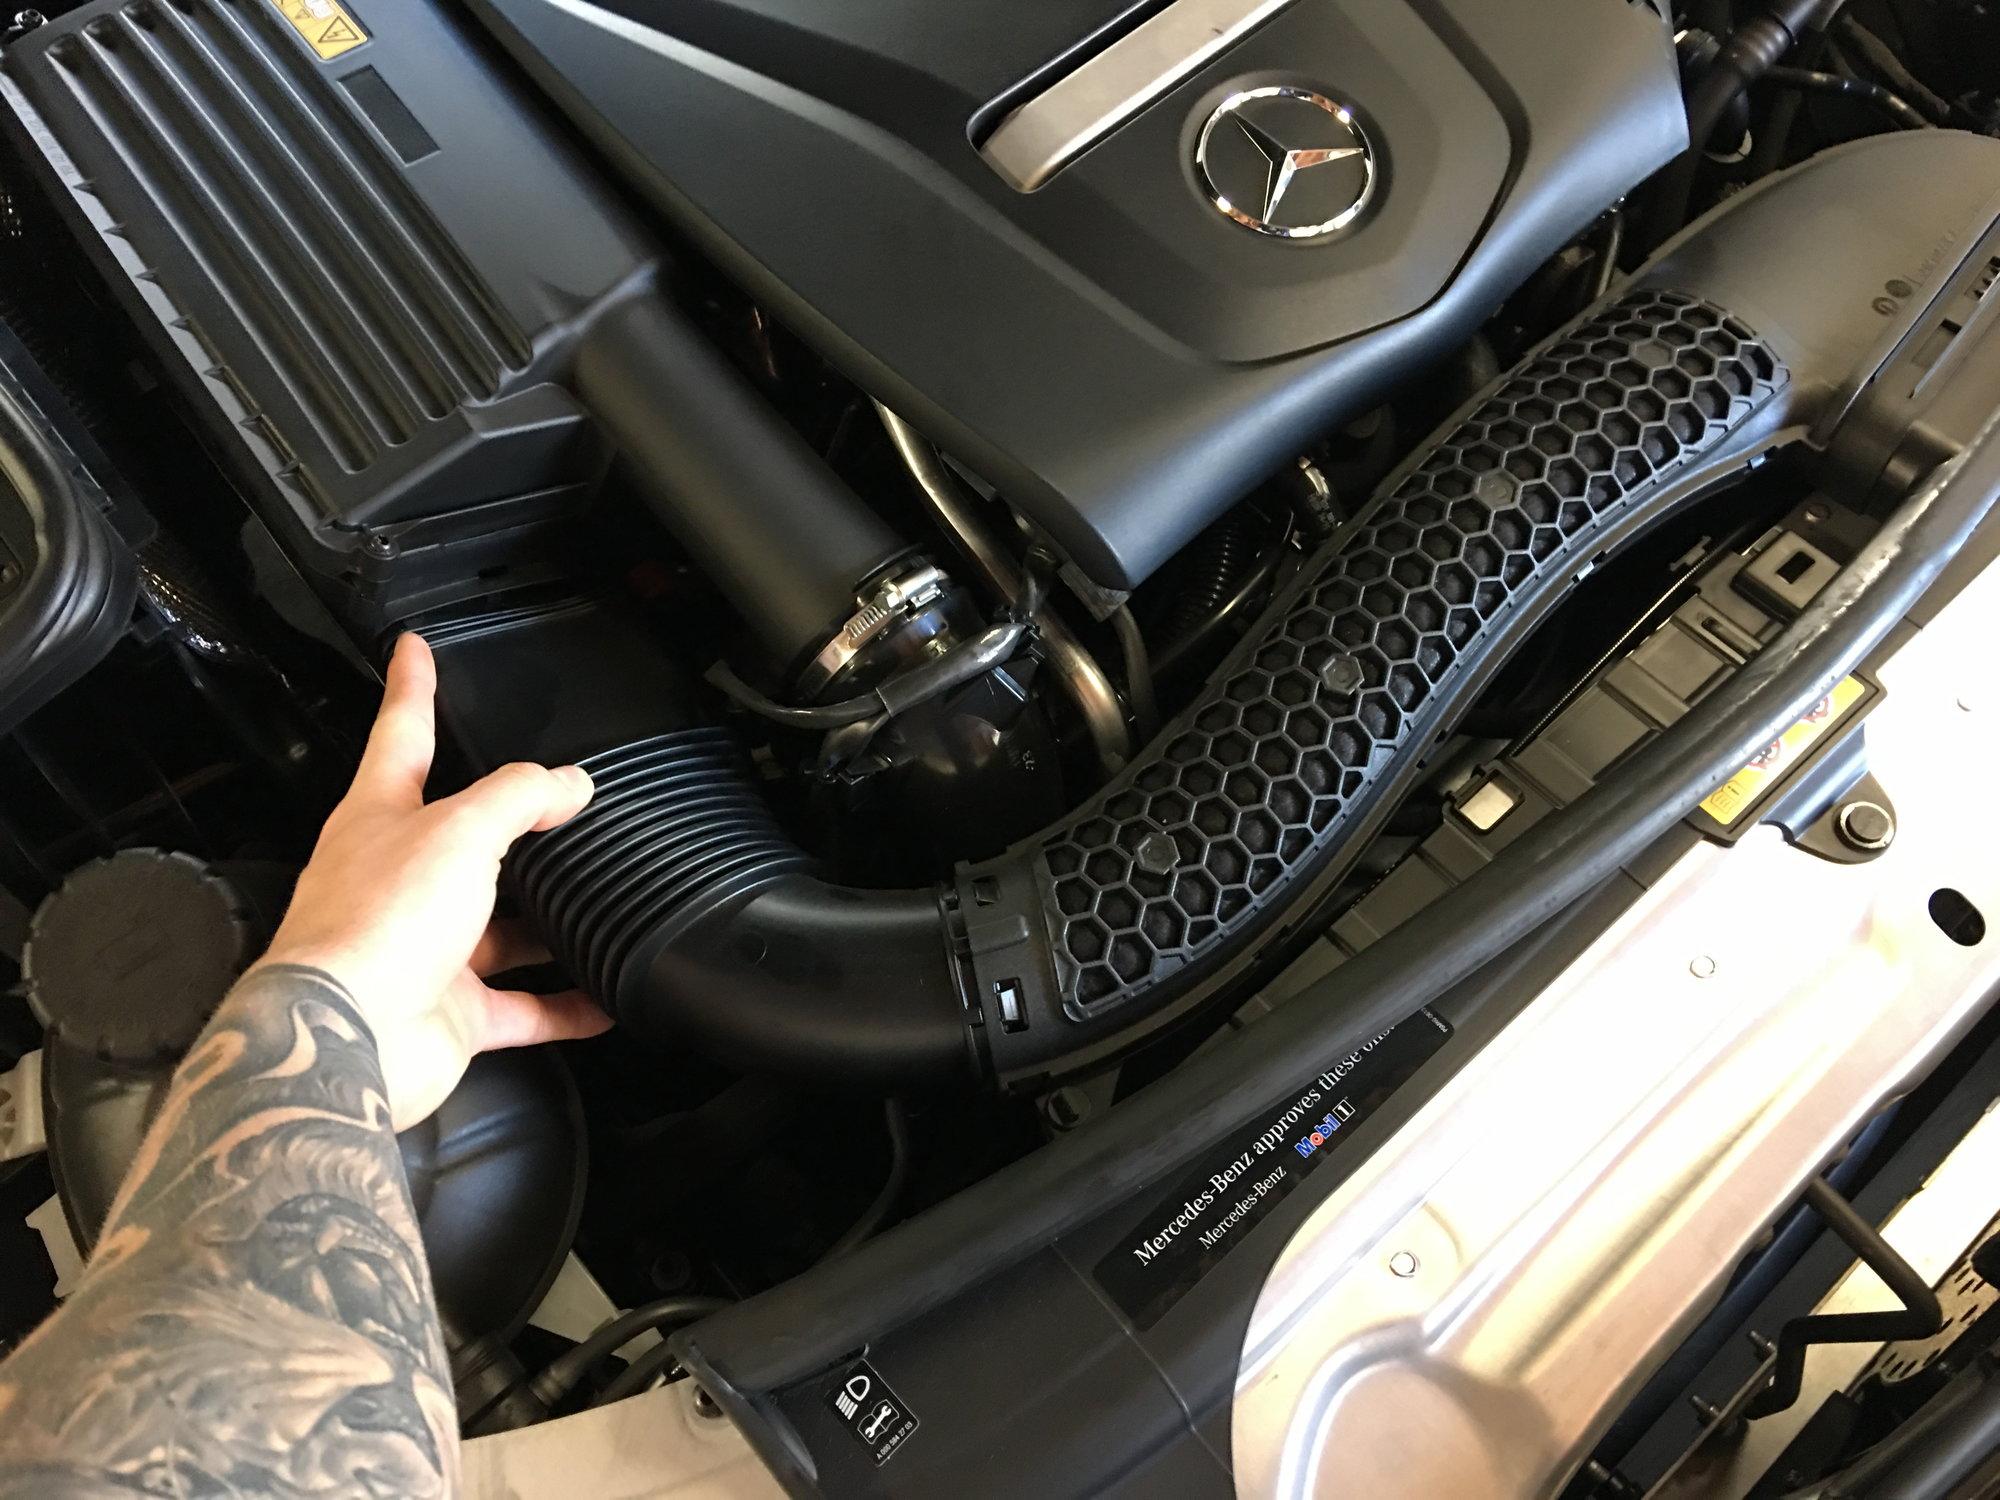 DIY install blow off valve spacer (BOV) pshhh - MBWorld org